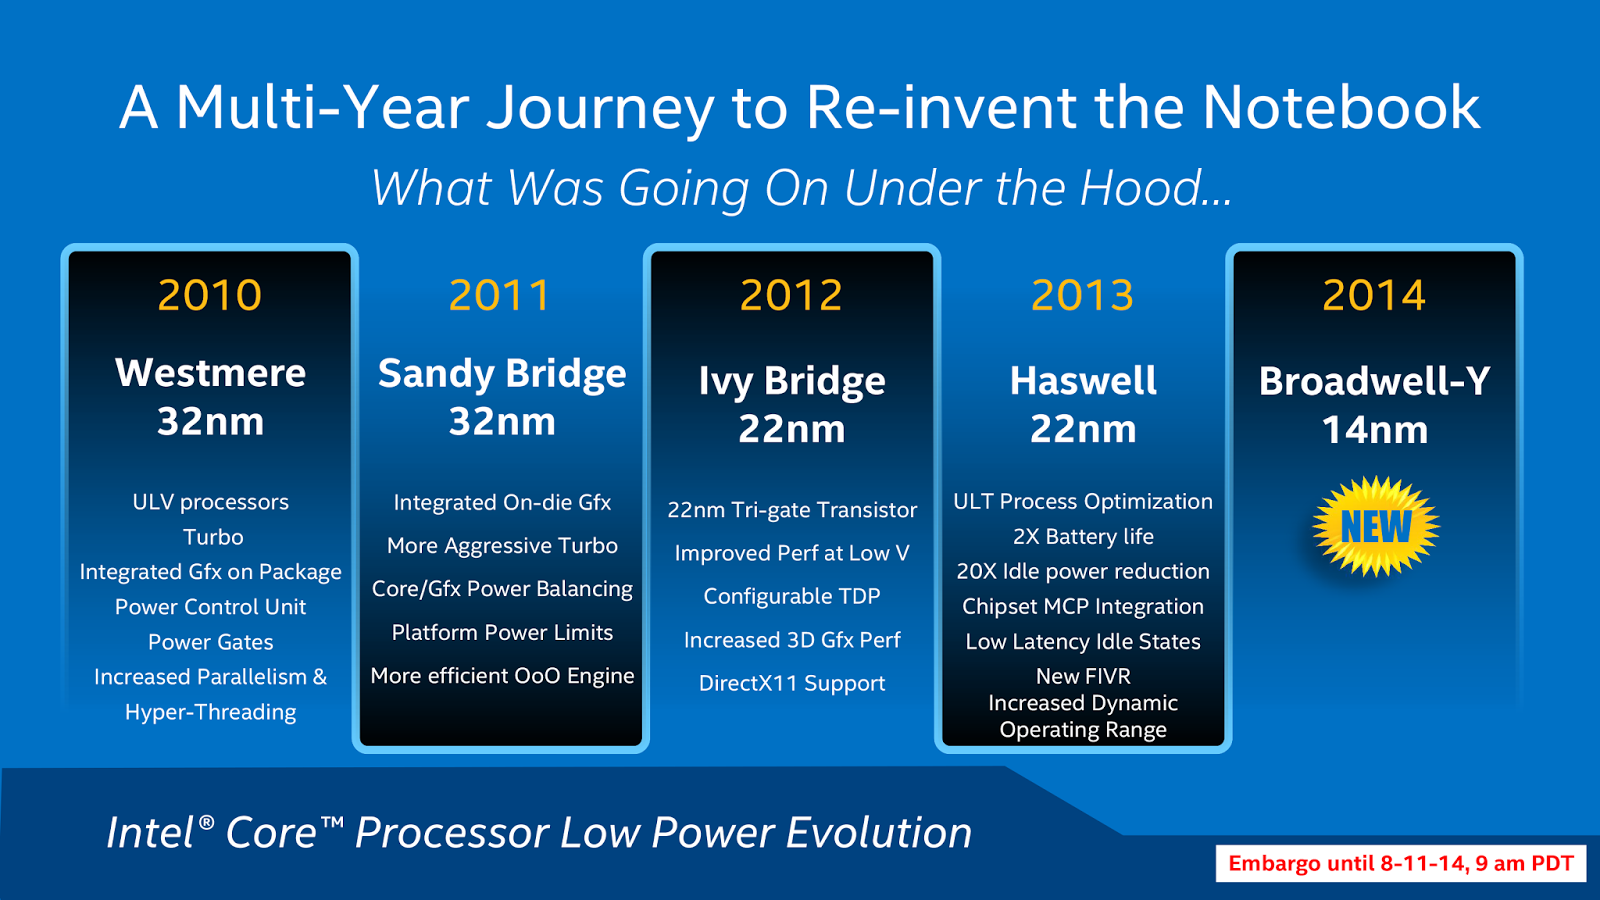 Intel's Processor Journey